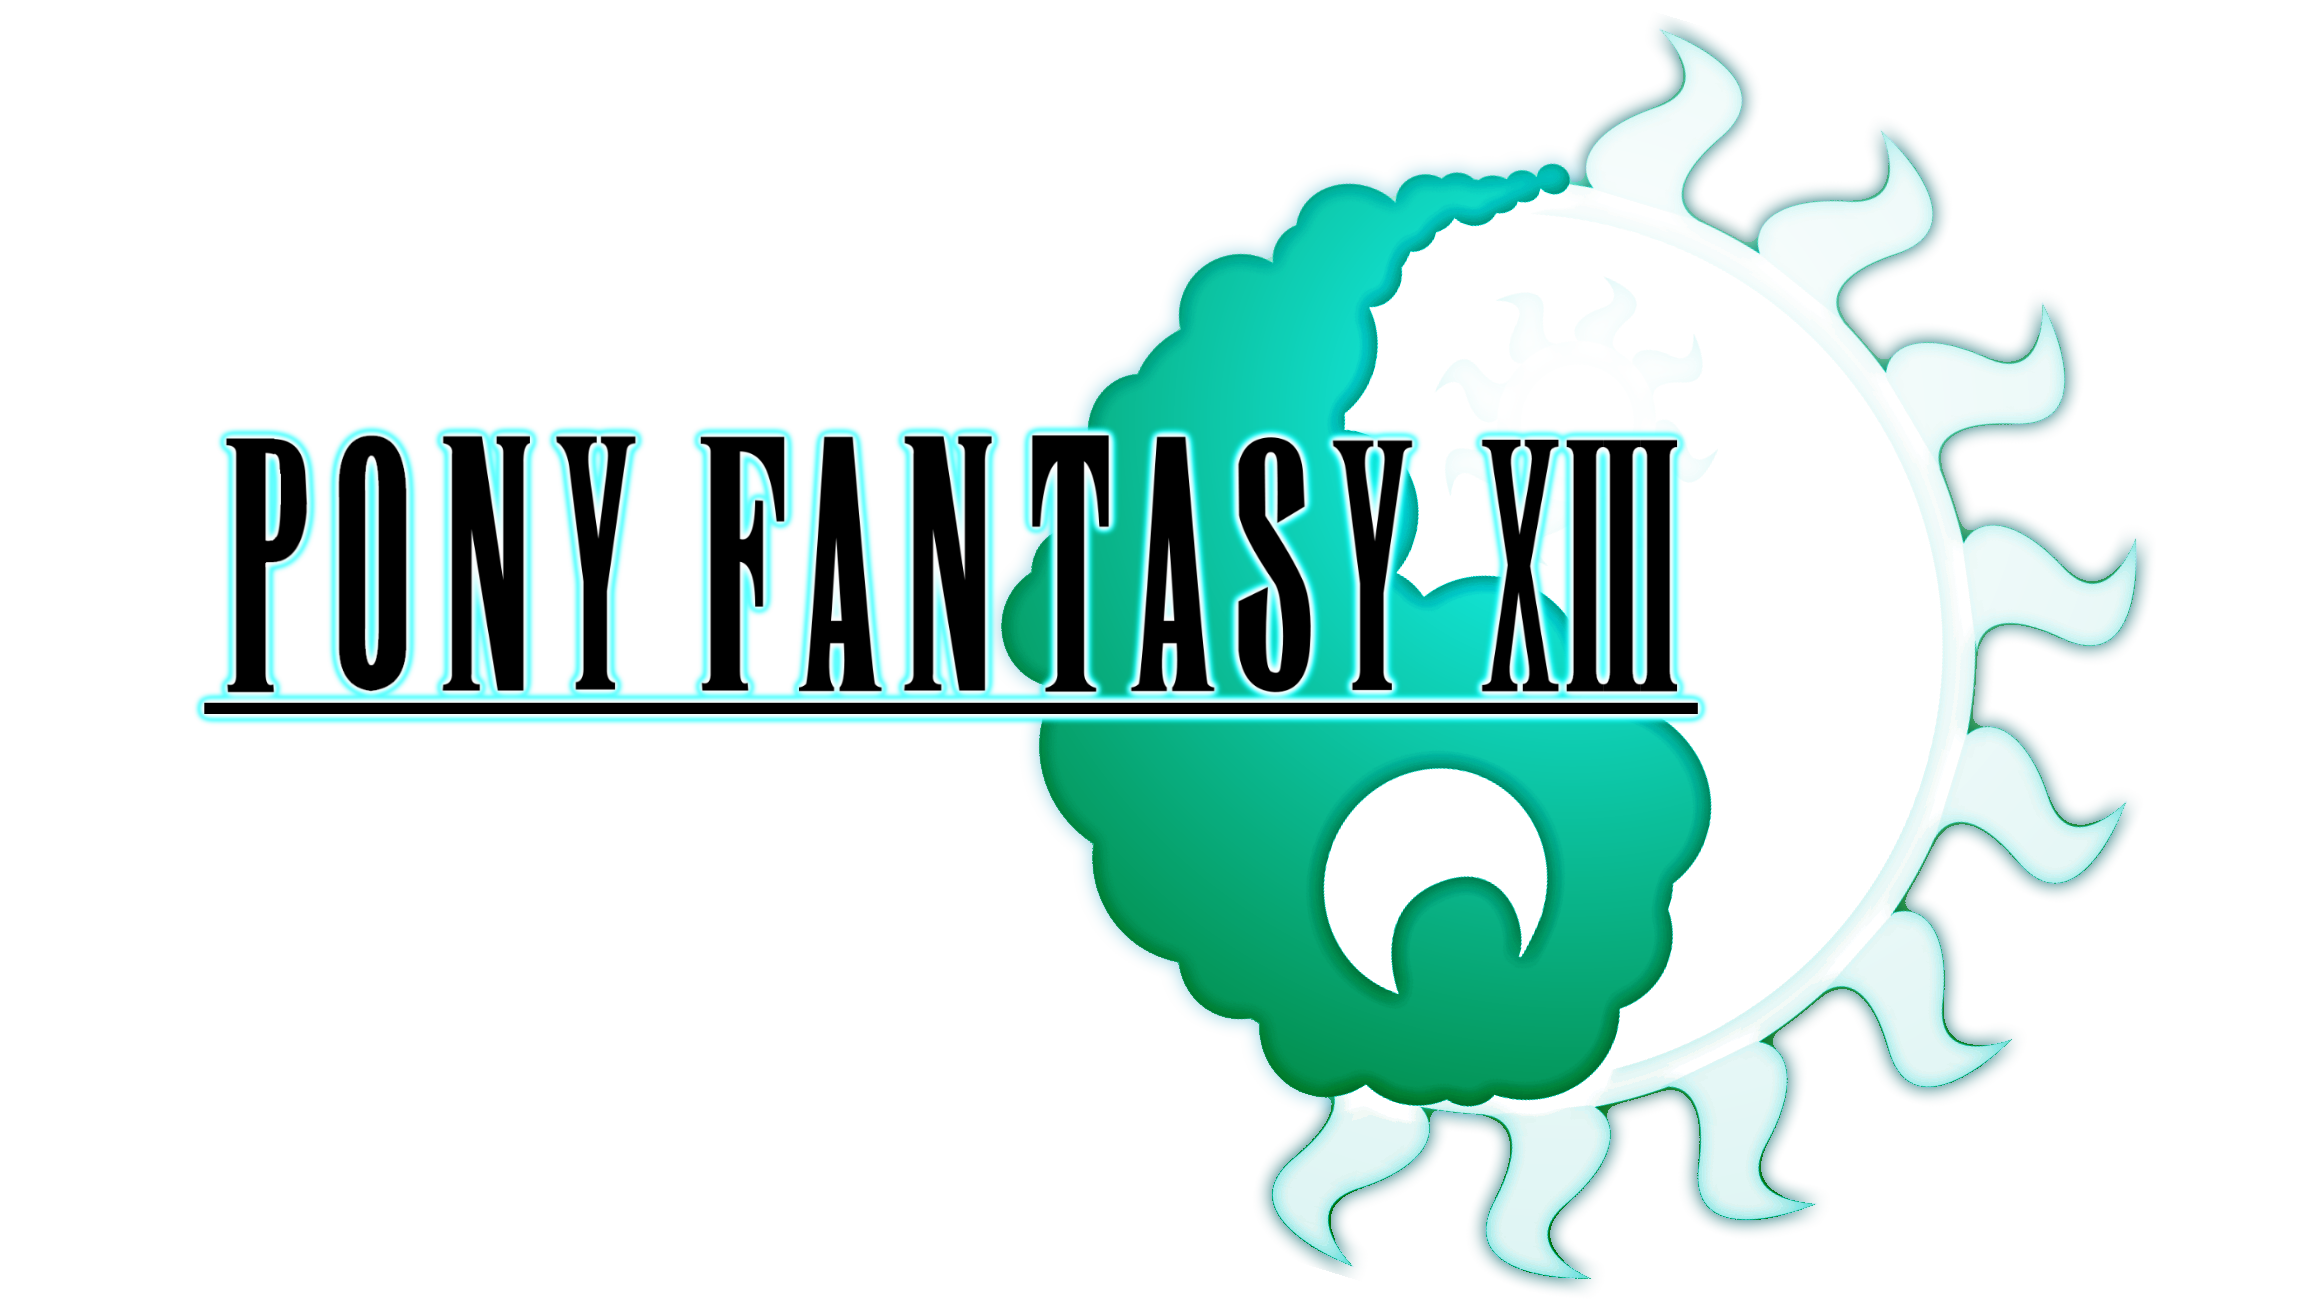 Pony Fantasy XIII Logo by TheAuthorGl1m0